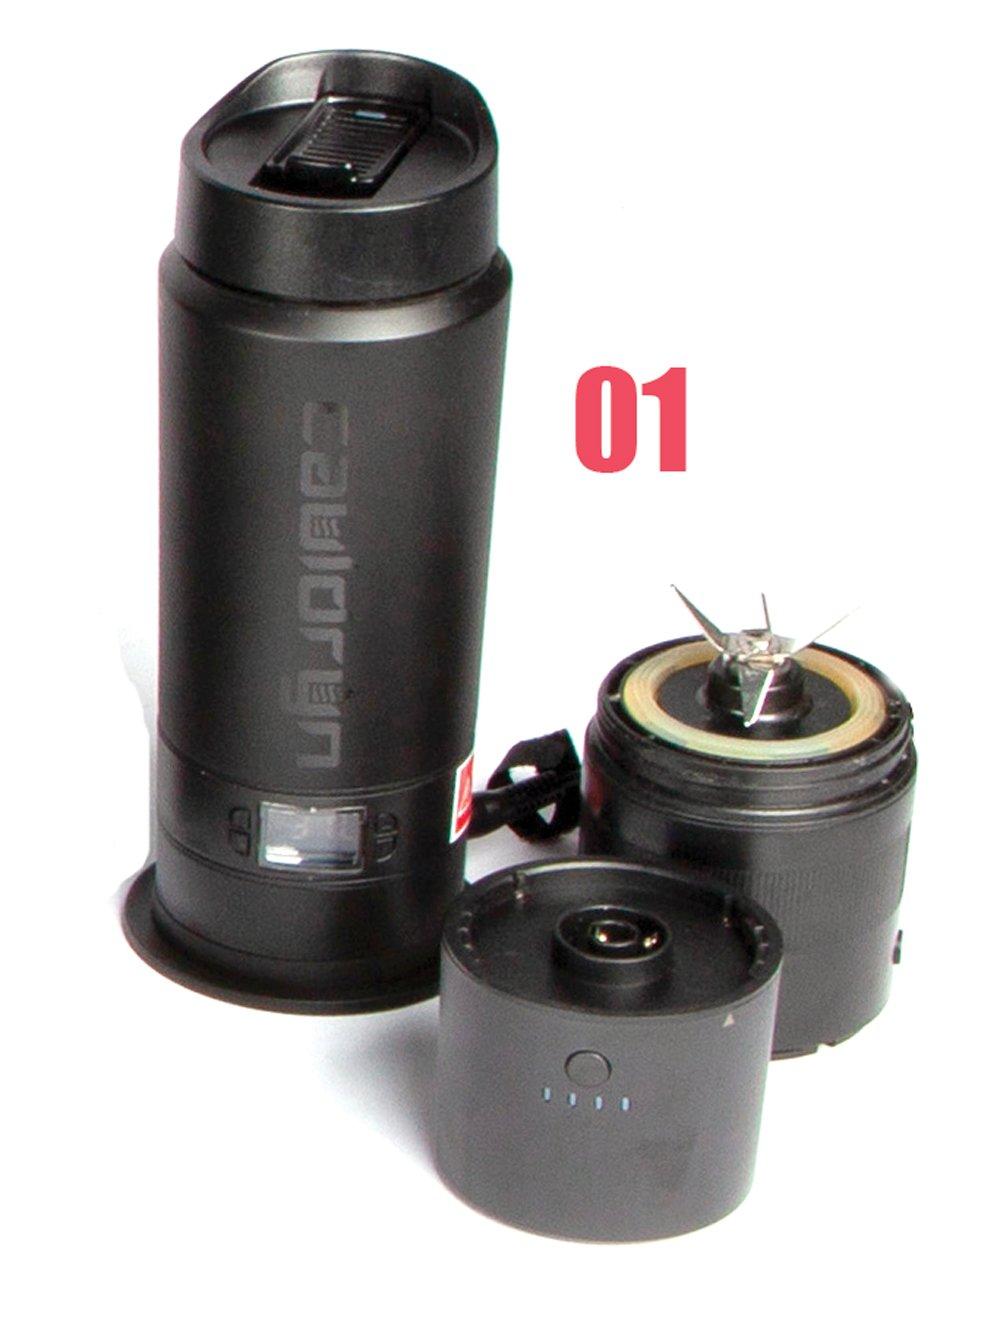 Cauldryn Coffee Smart Mug and Blender Combo hiking supplies